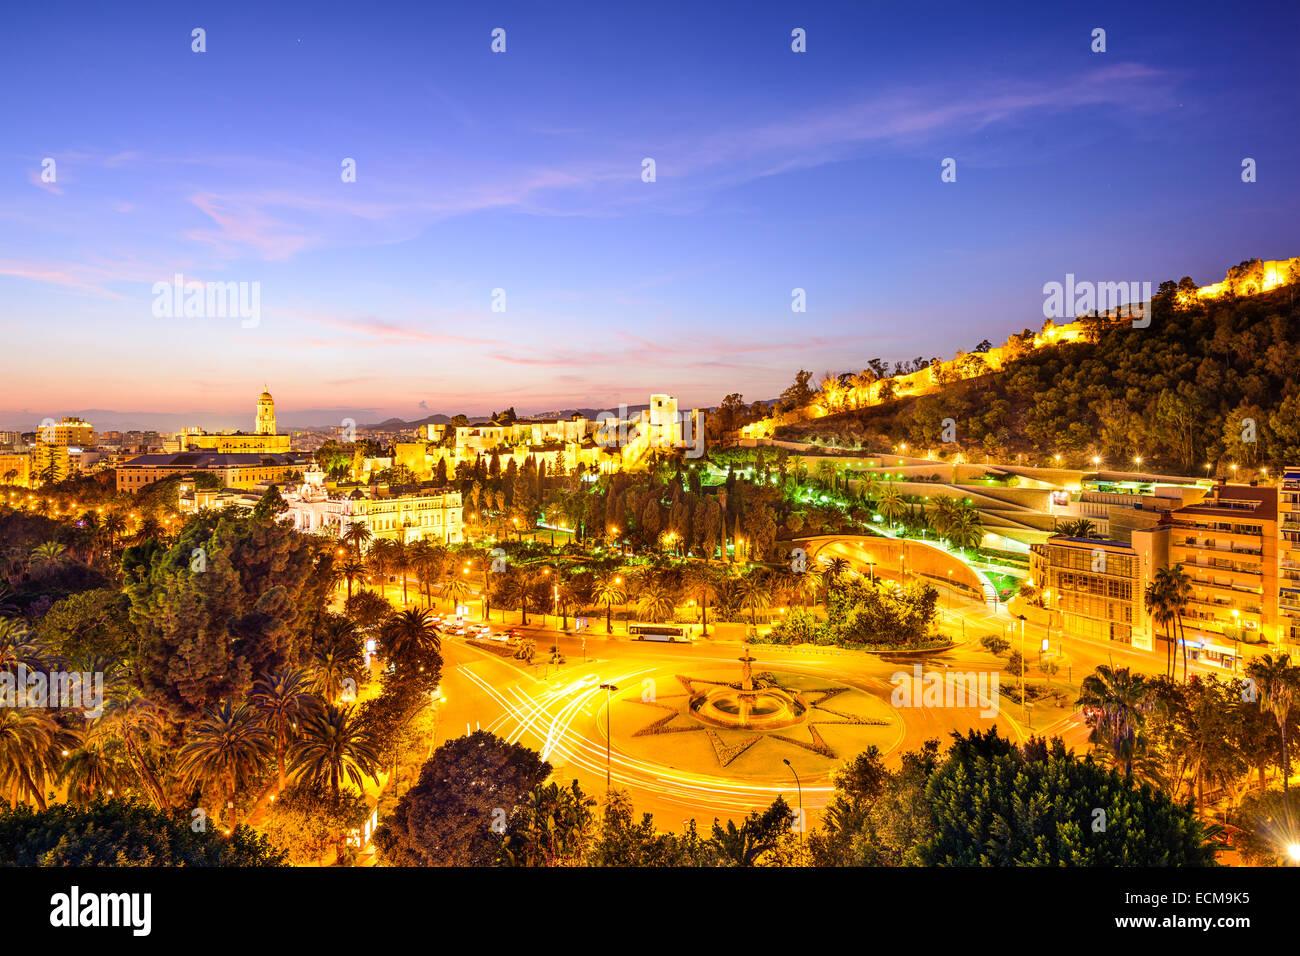 Malaga, Spain cityscape at the Cathedral, City Hall and Alcazaba Moorish fort. - Stock Image